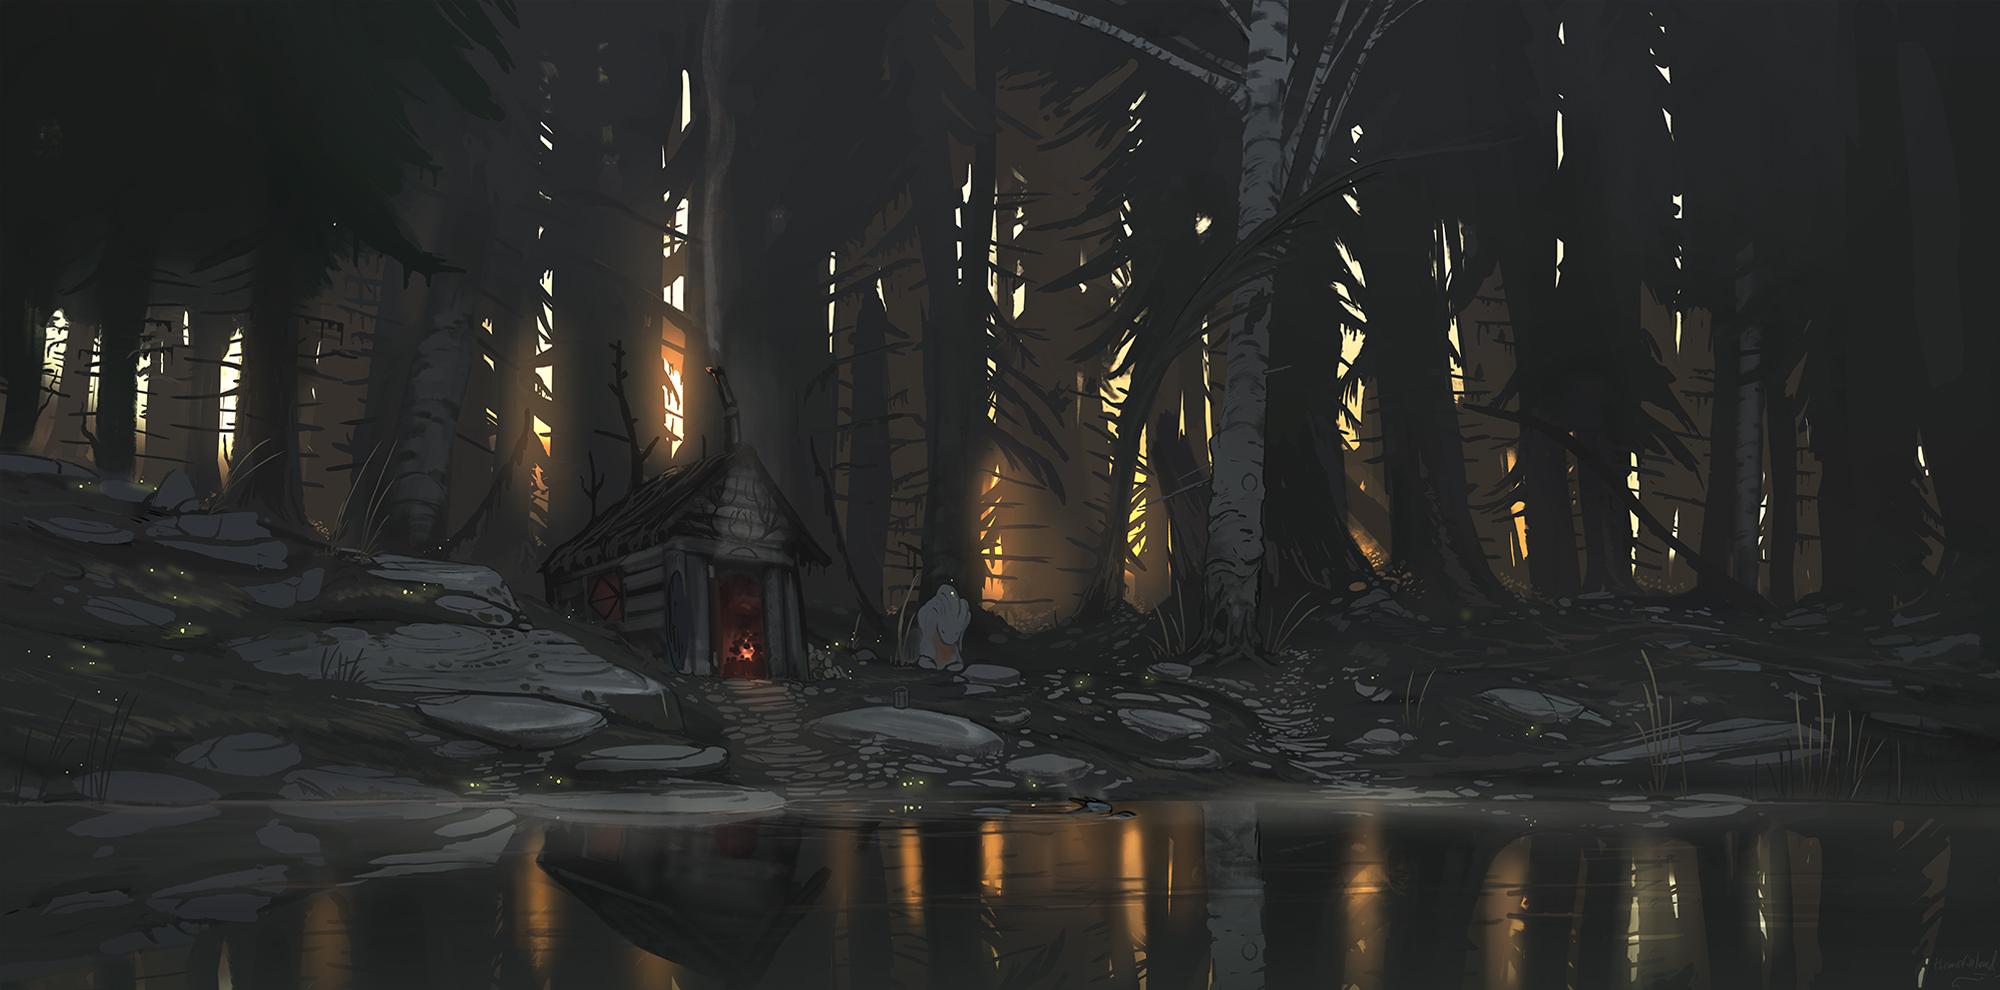 Evening sauna